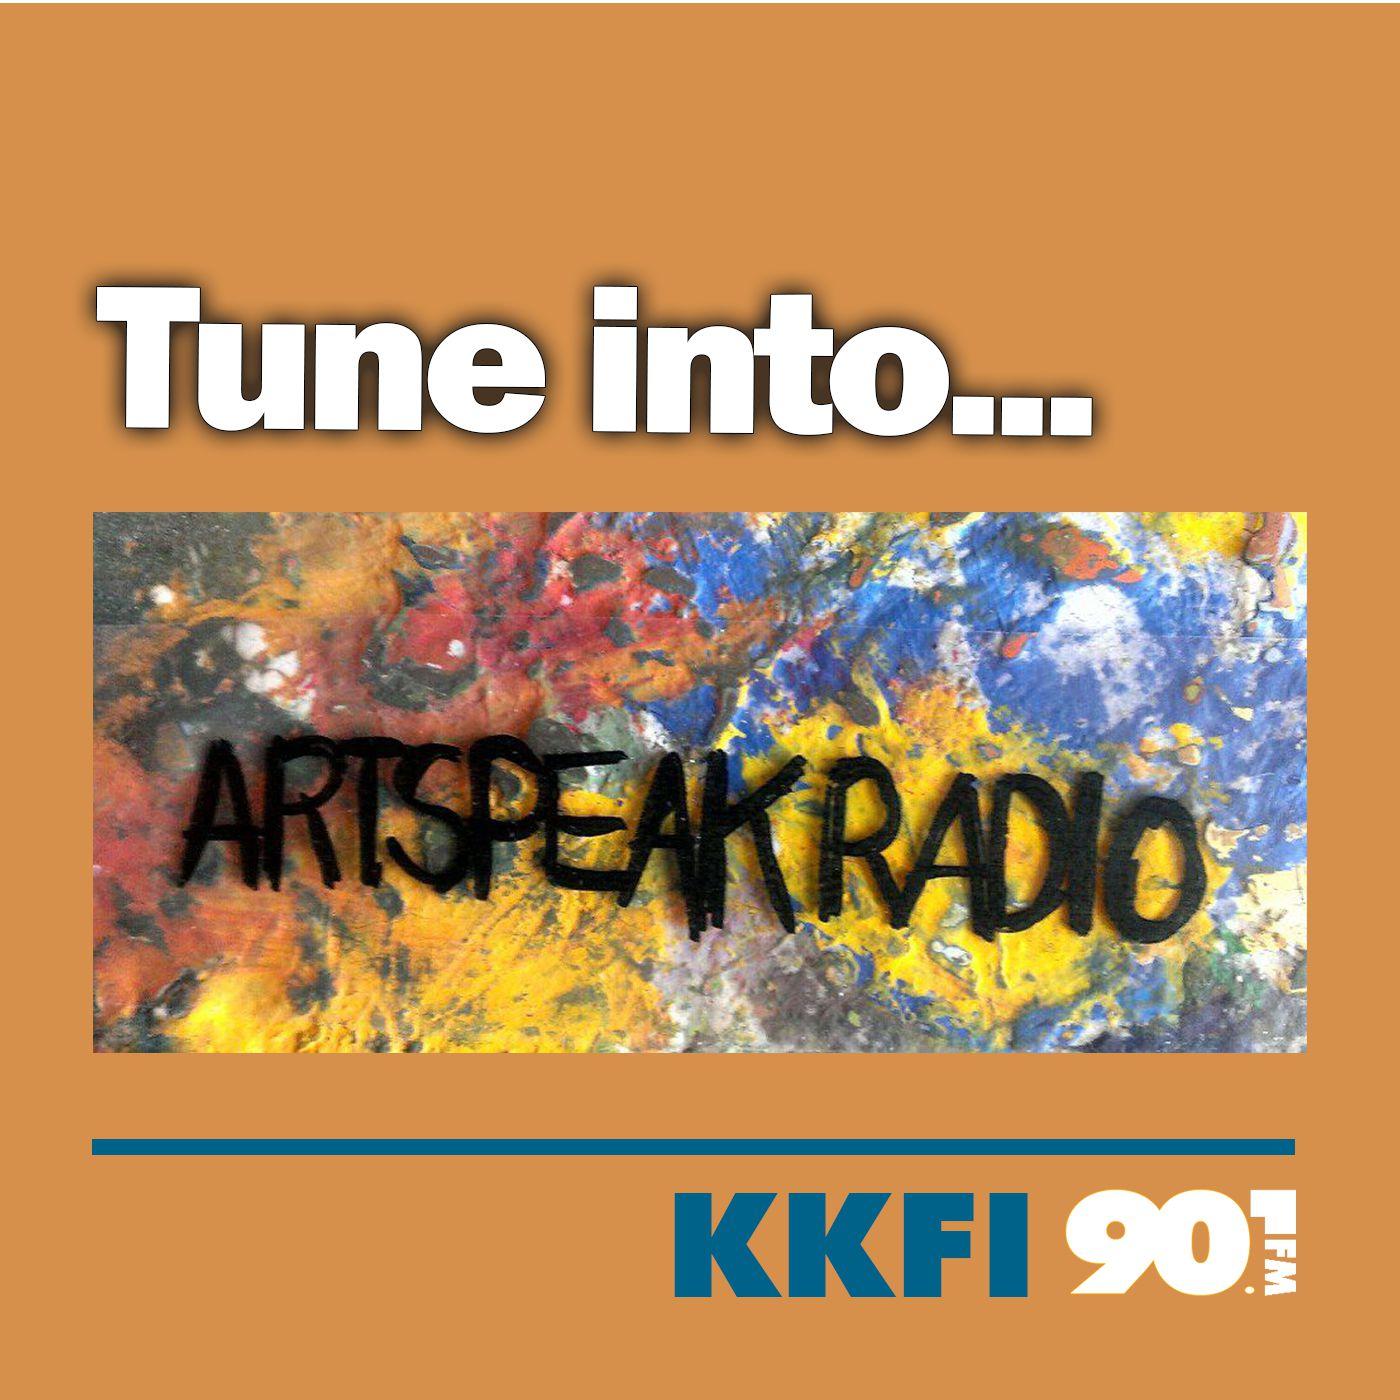 logo-artspeak-radio-1400x1400